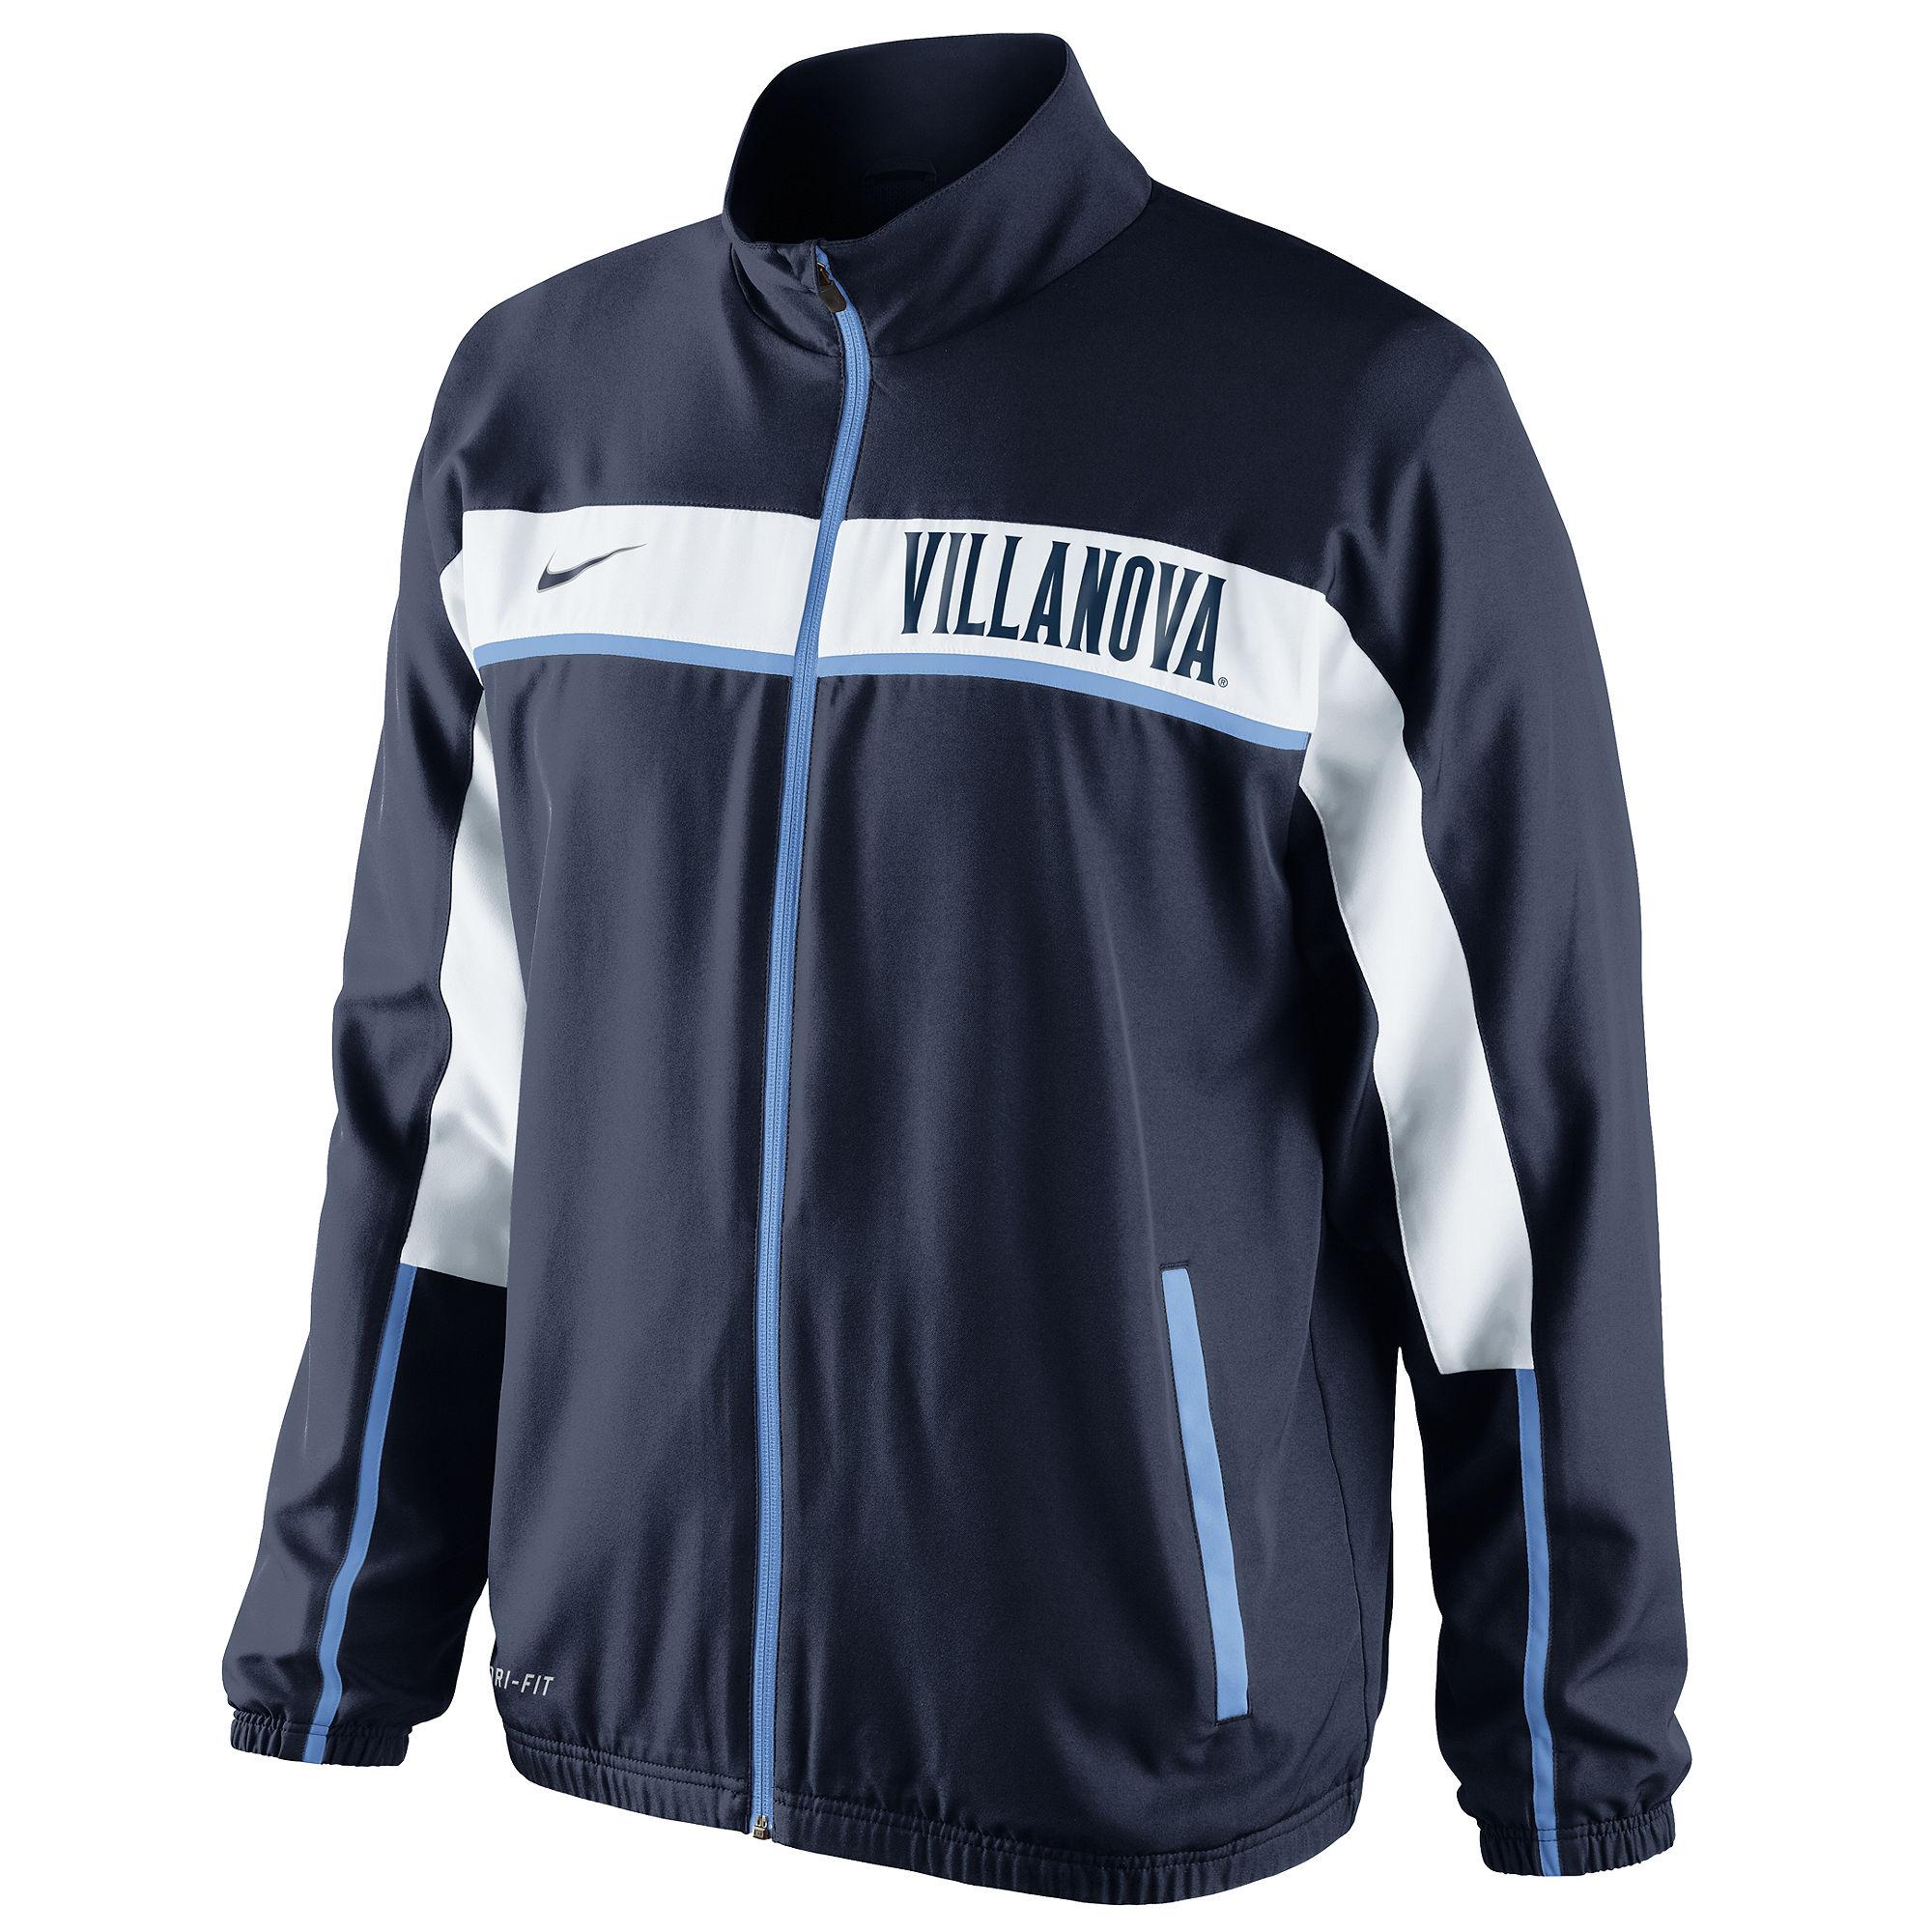 Nike Villanova Wildcats Basketball Game Jacket In Black